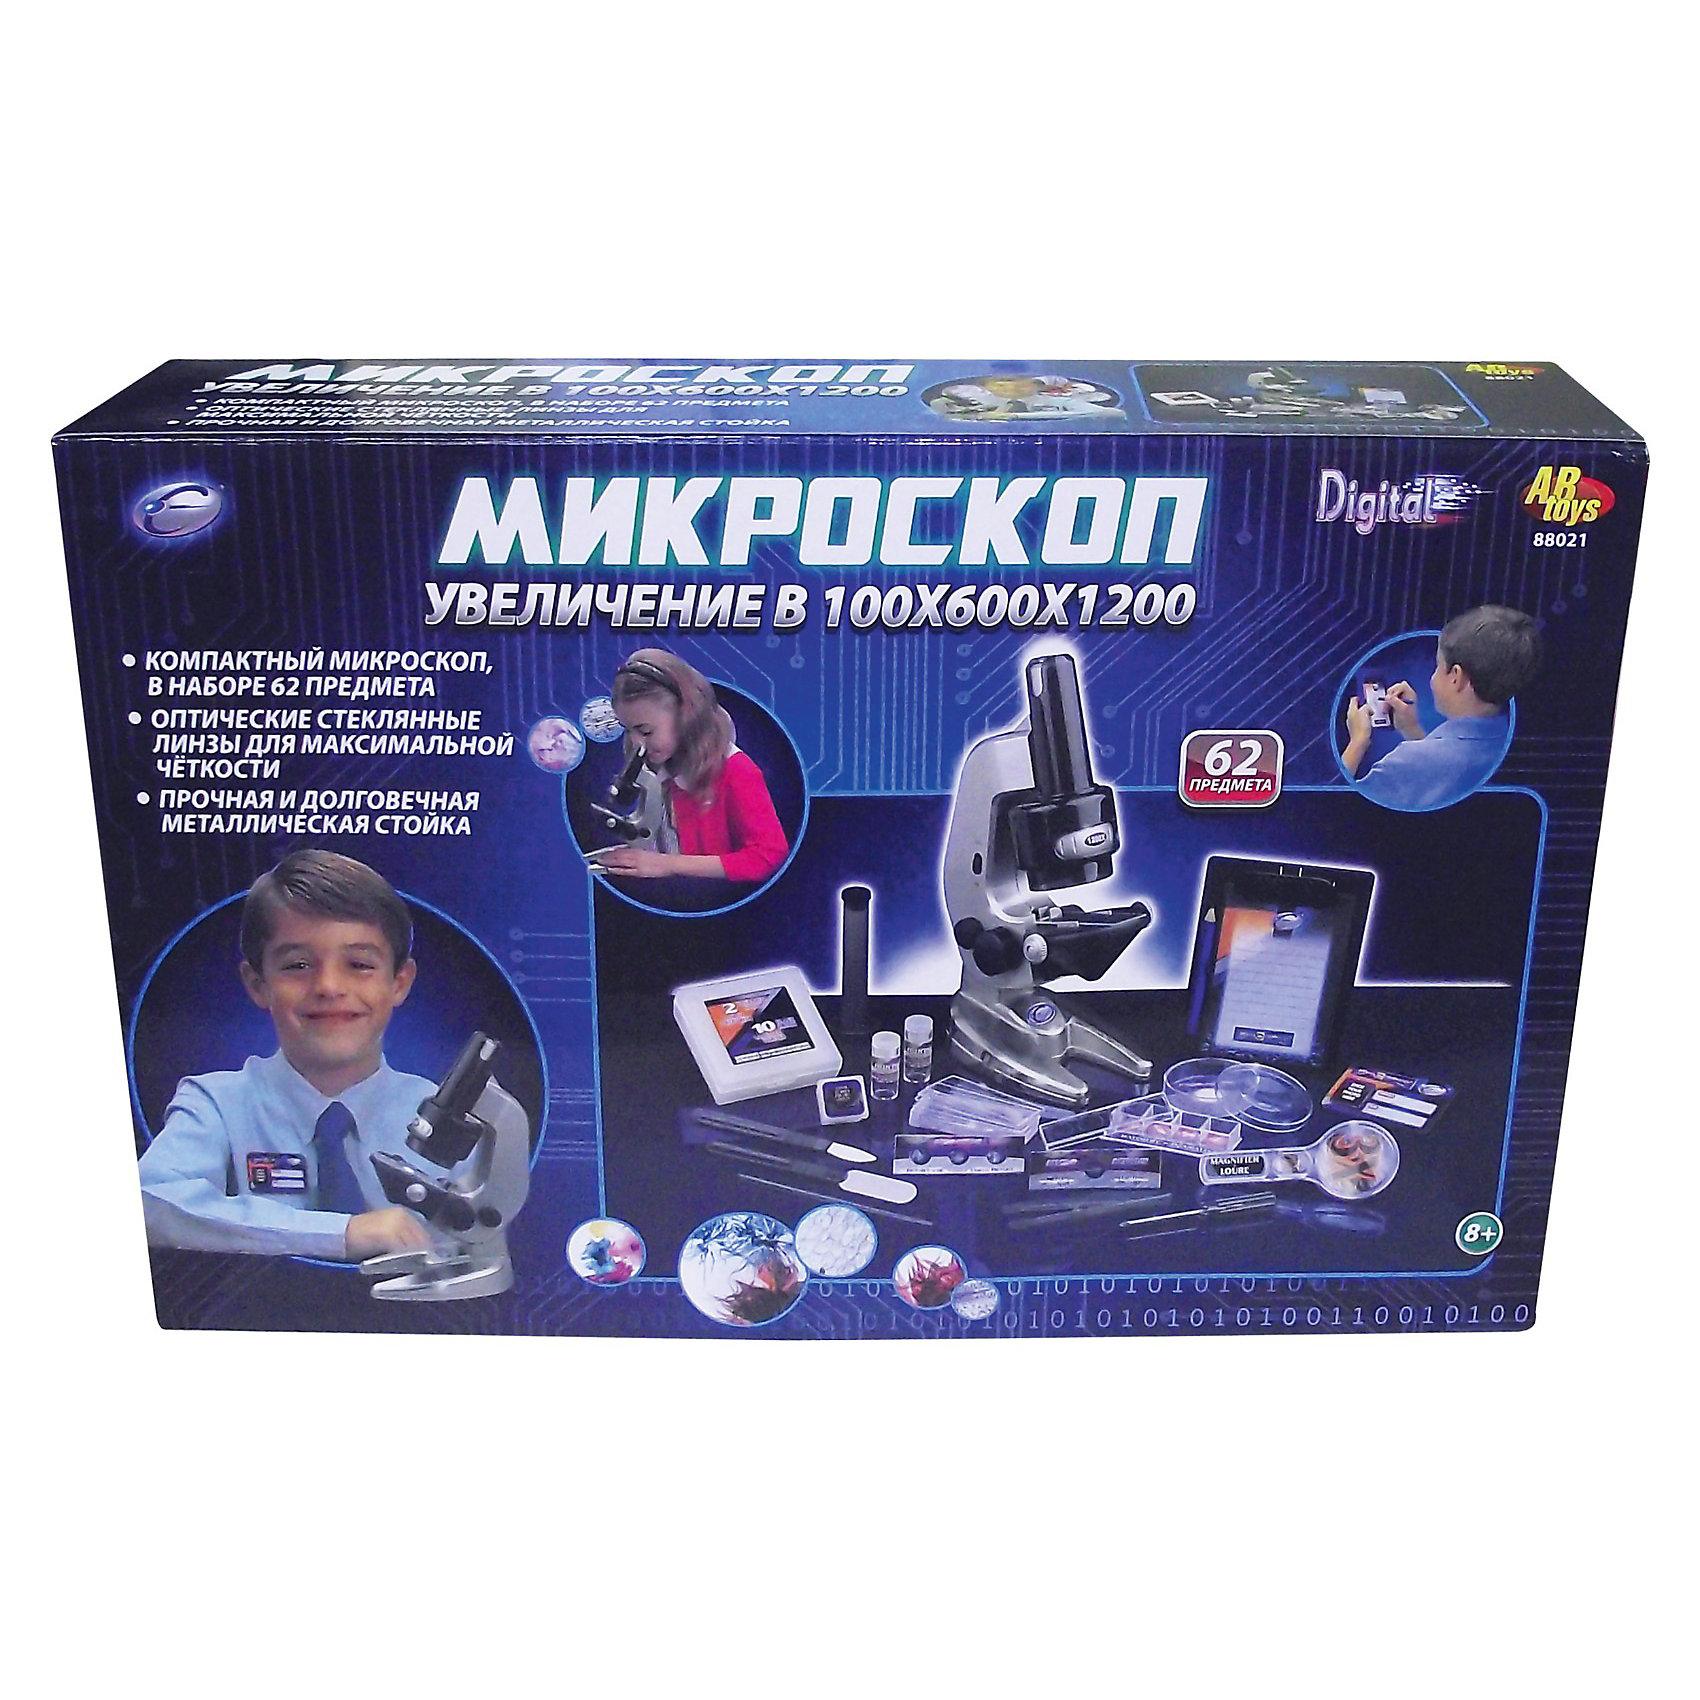 - Eastcolight Набор микроскоп электромеханический, с аксессуарами, 62 пр. eastcolight мр 900 микроскоп с панорамной насадкой